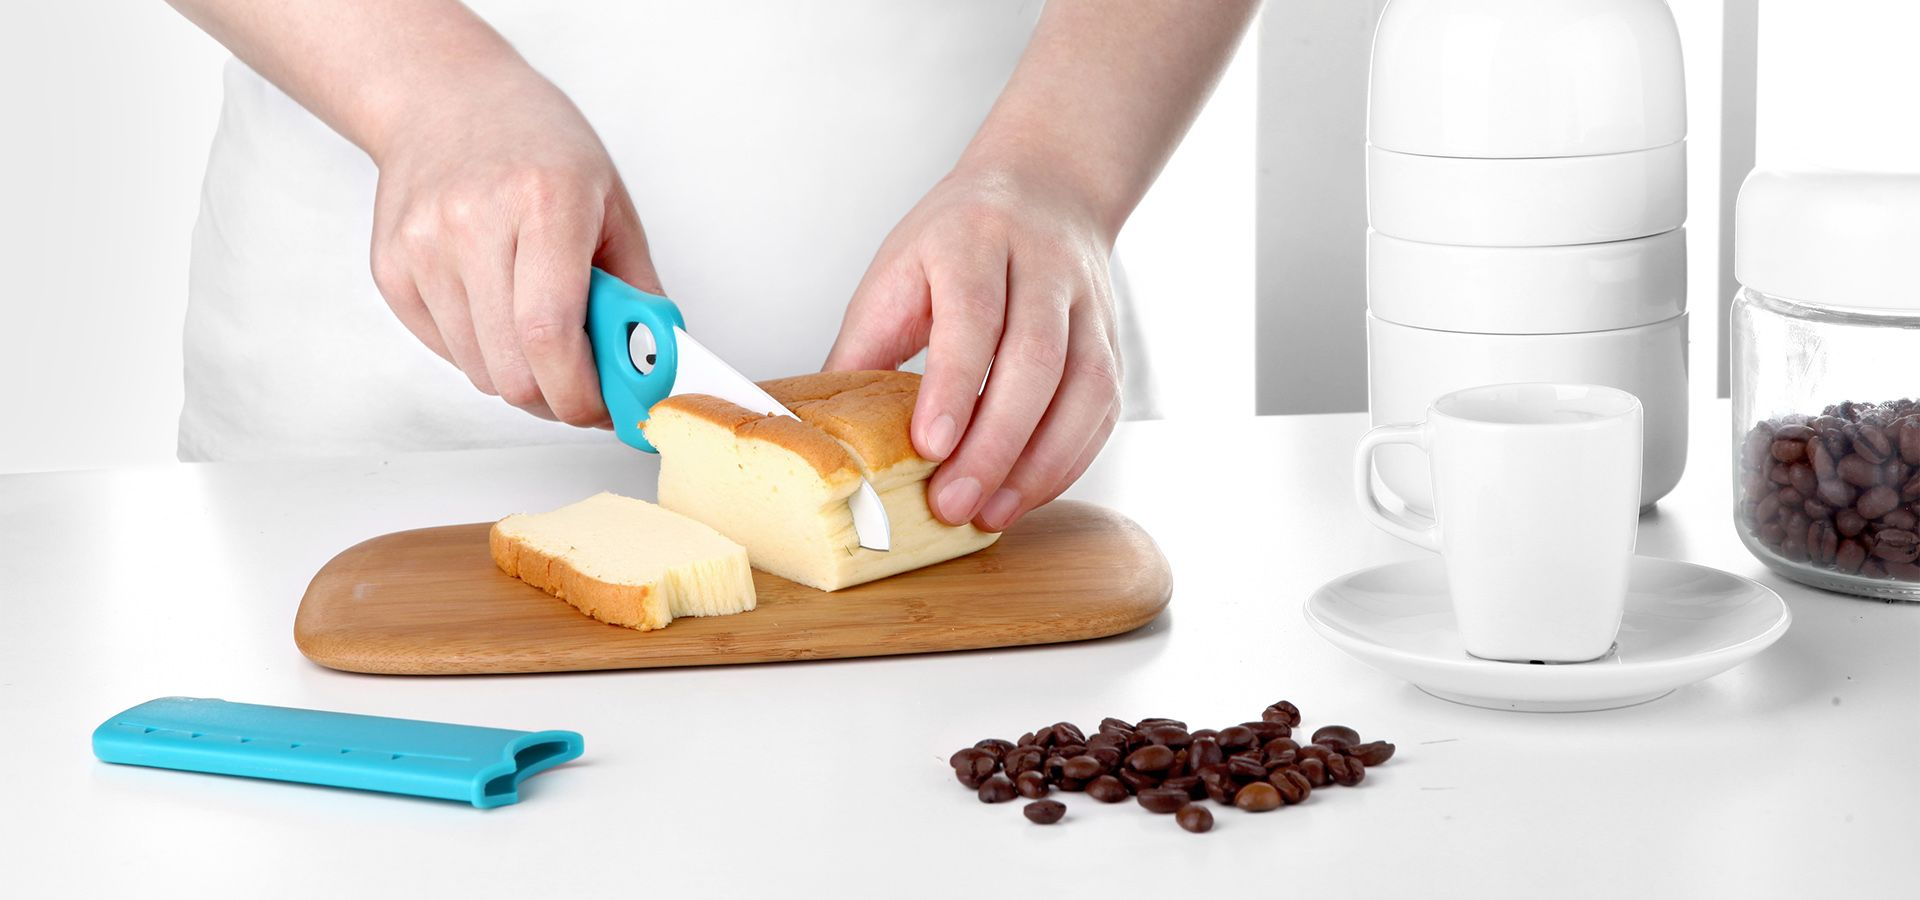 SWAMPY Utility cutting knife